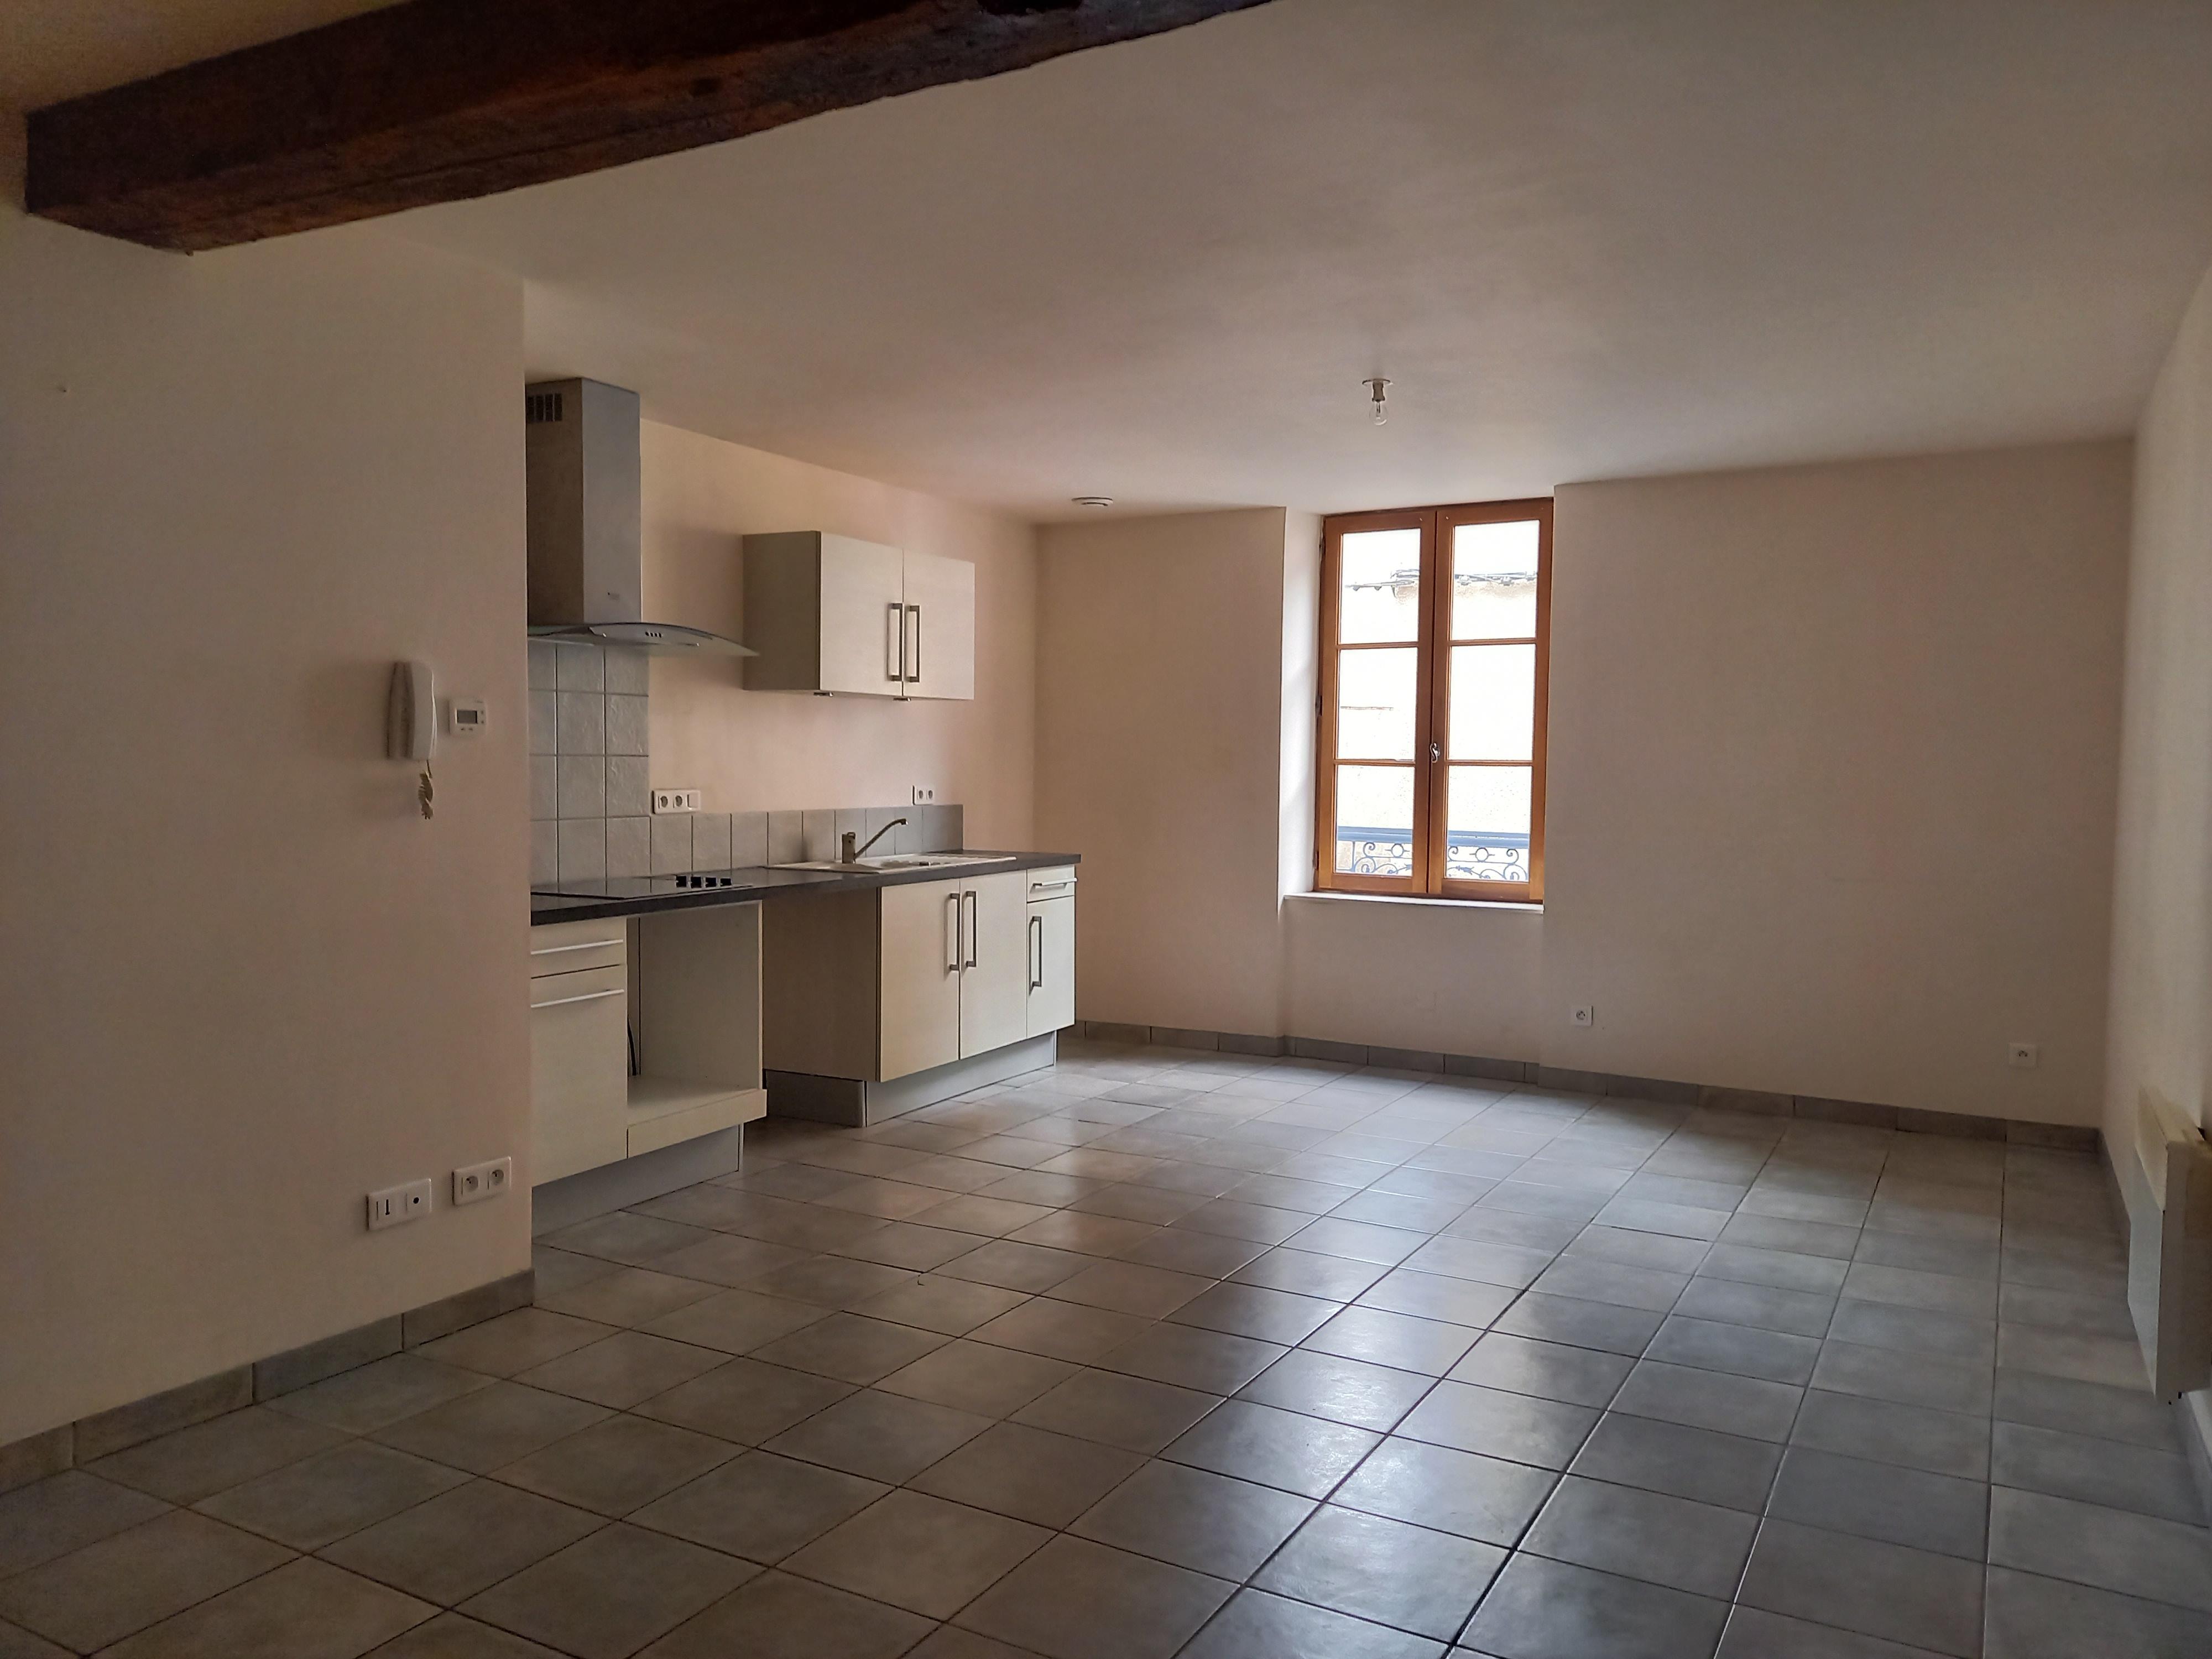 Appartement T3 duplex à louer à FIGEAC centre